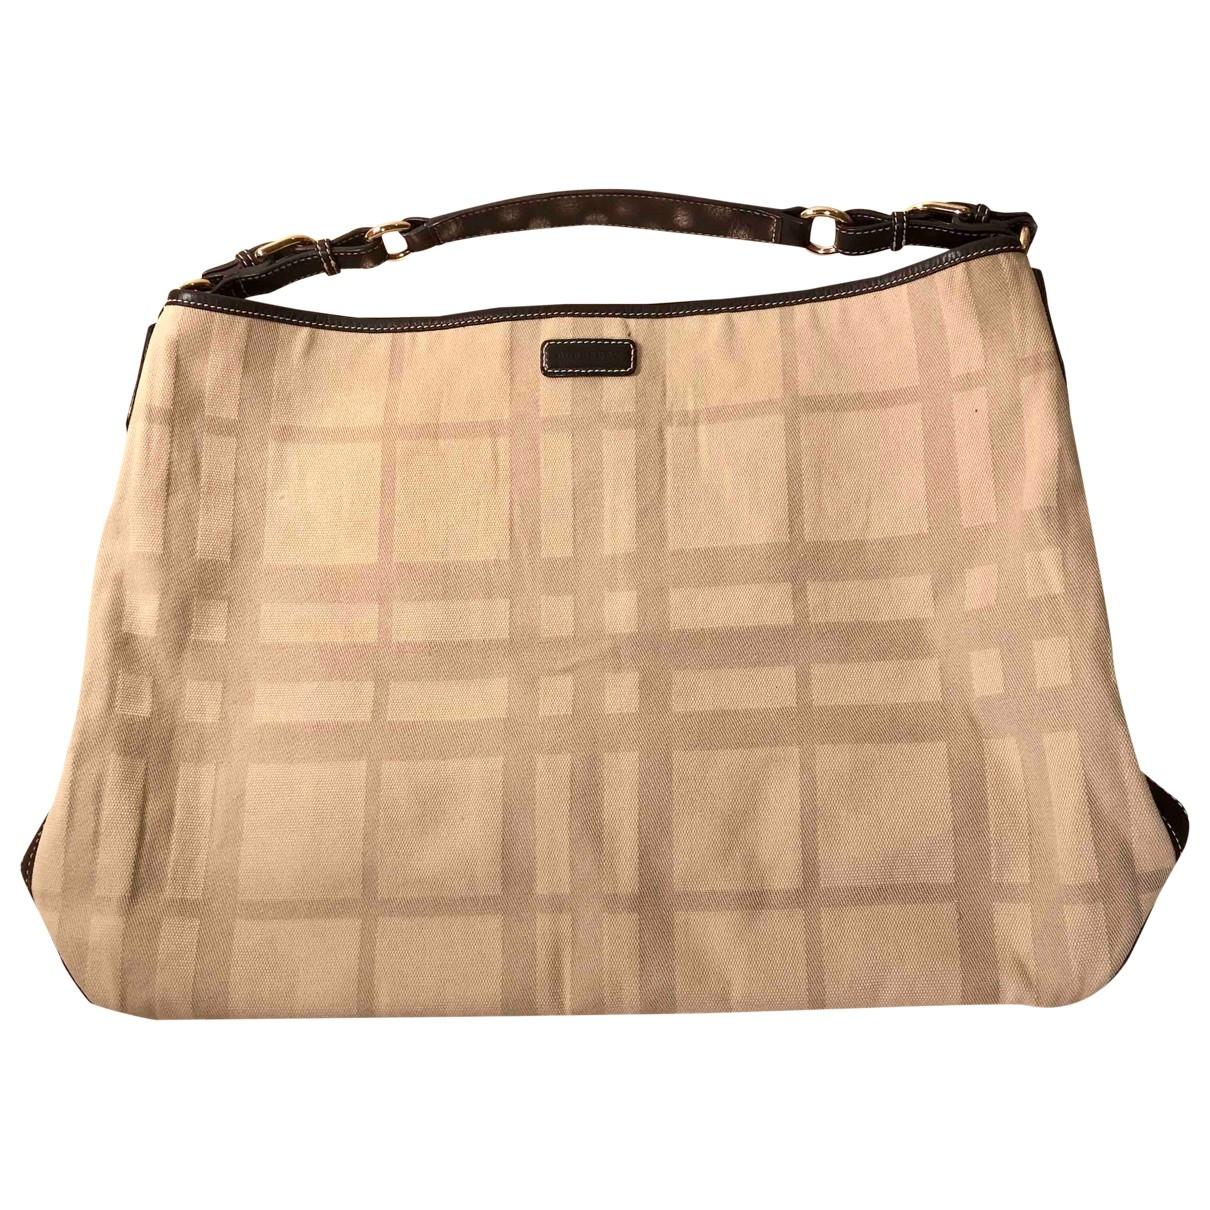 Burberry \N Beige Cotton handbag for Women \N